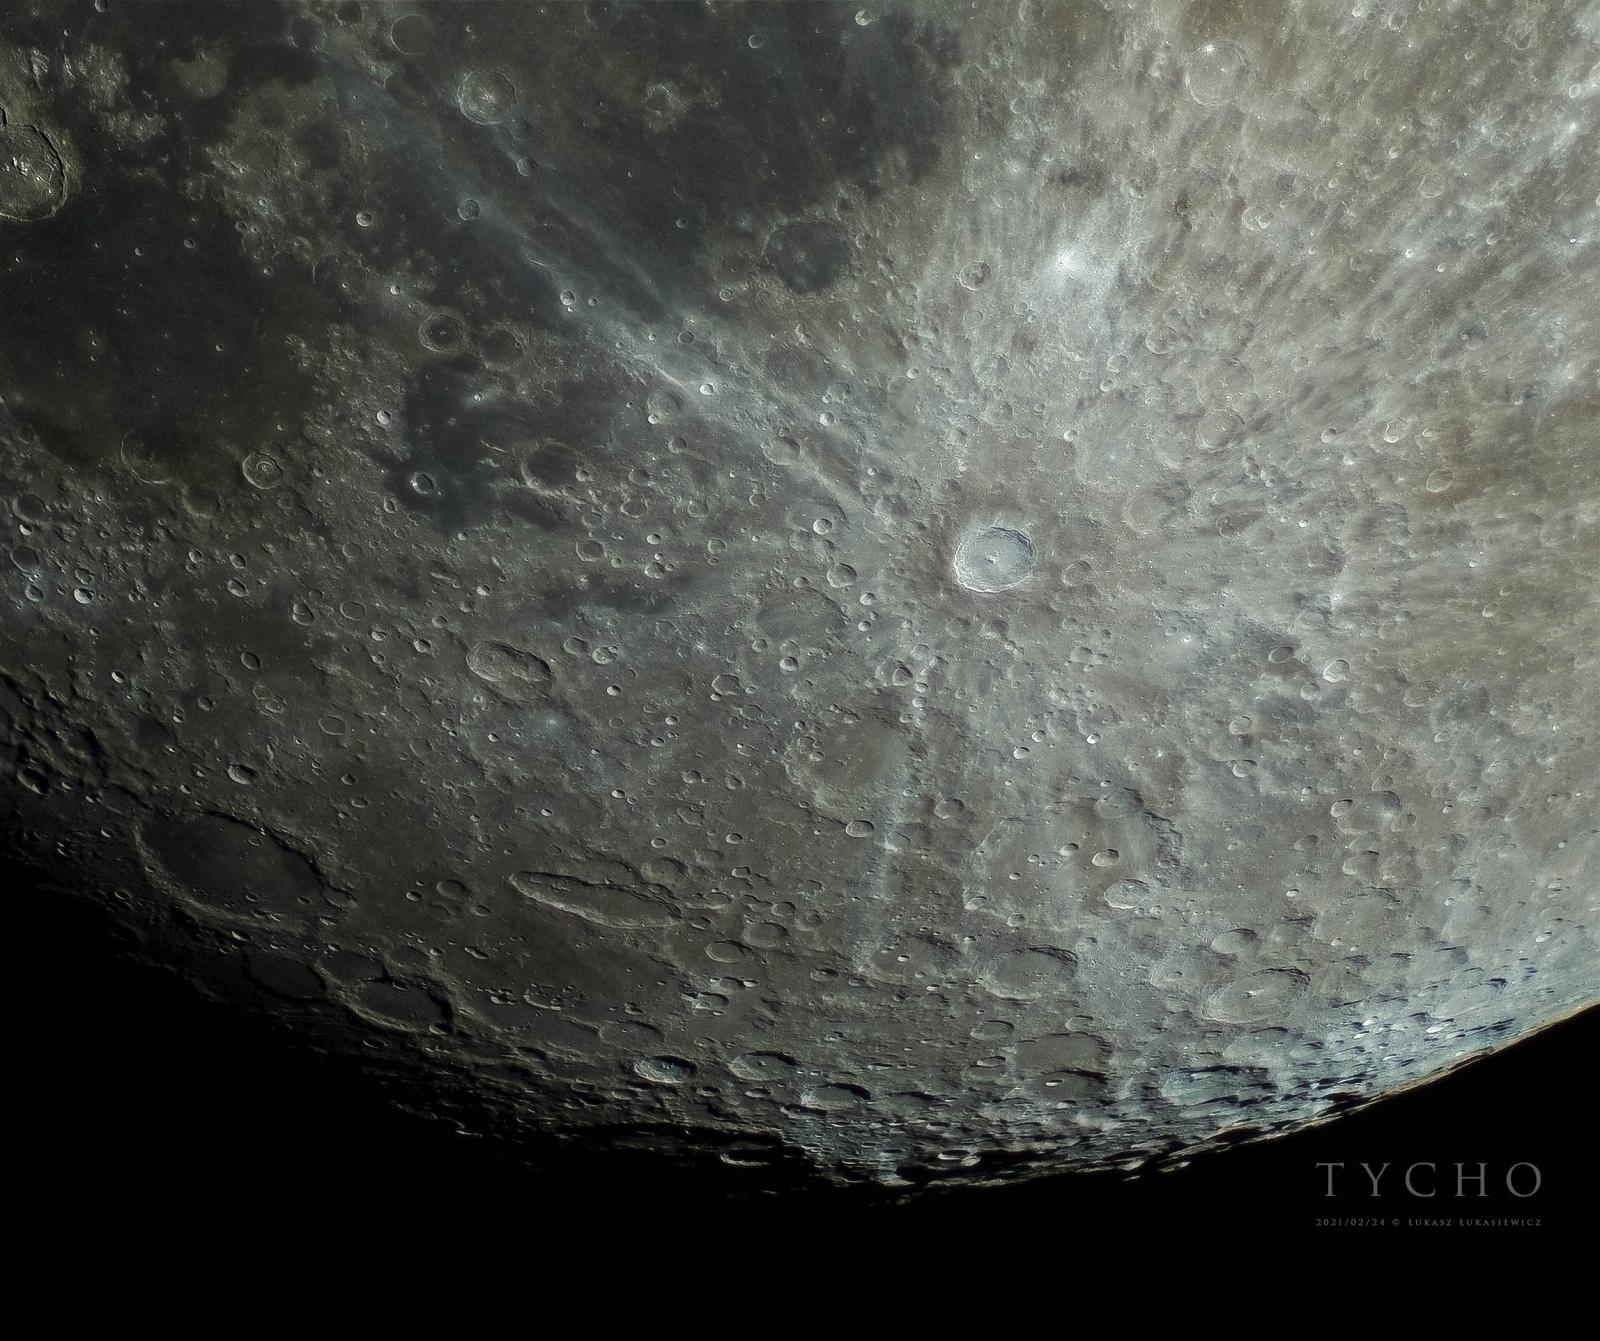 TYCHO-2021-02-24.jpg